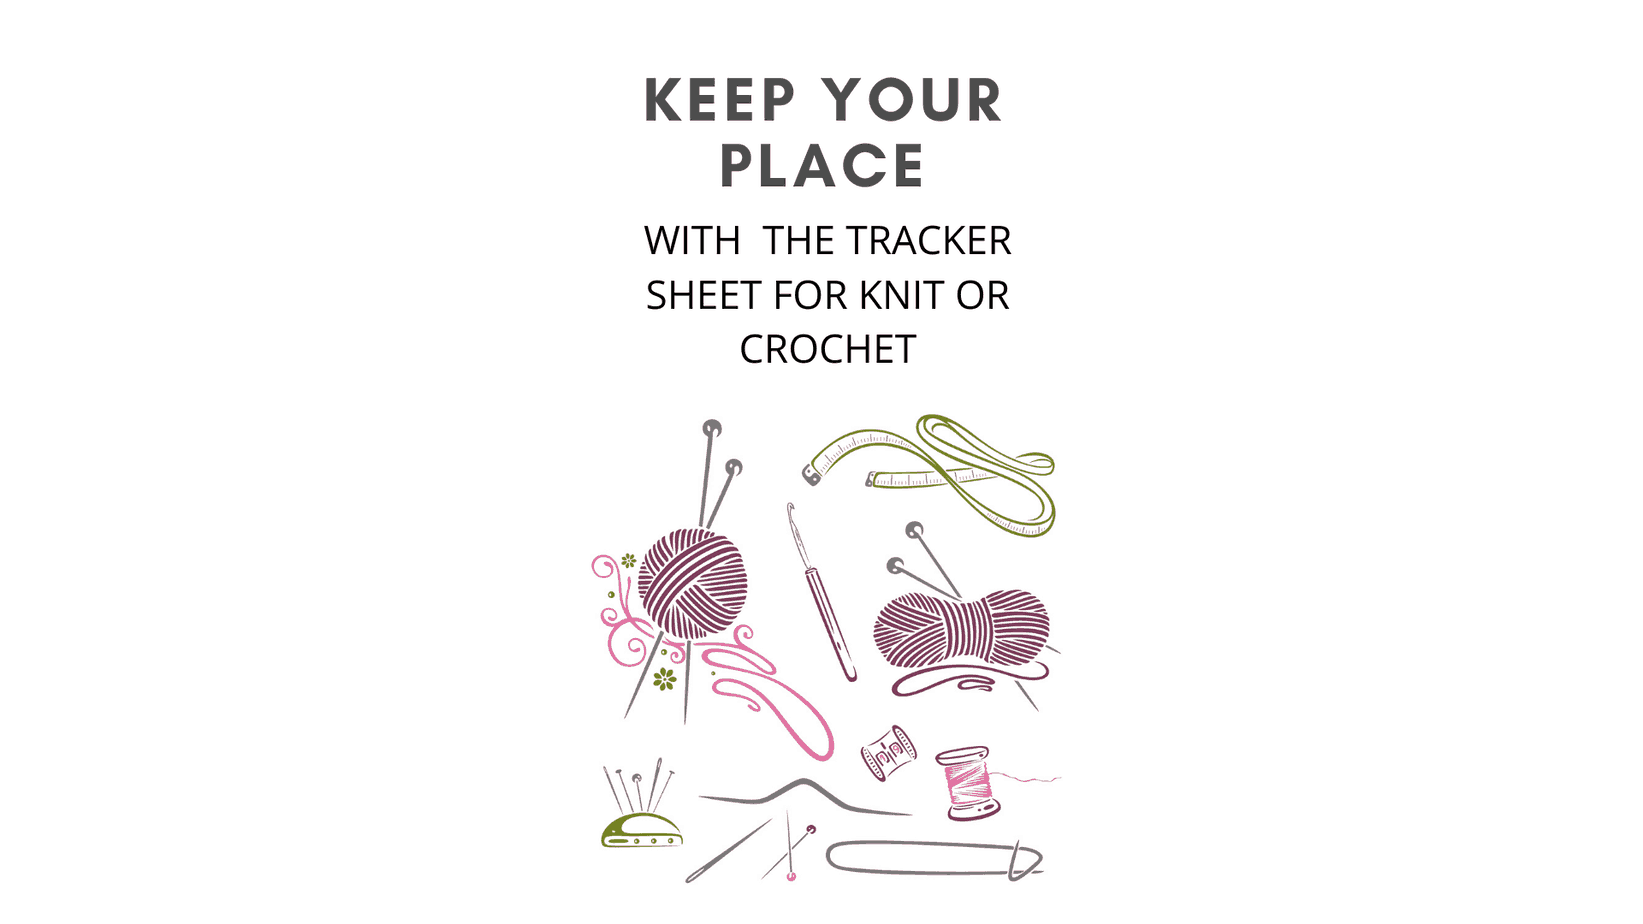 tracker sheet promo